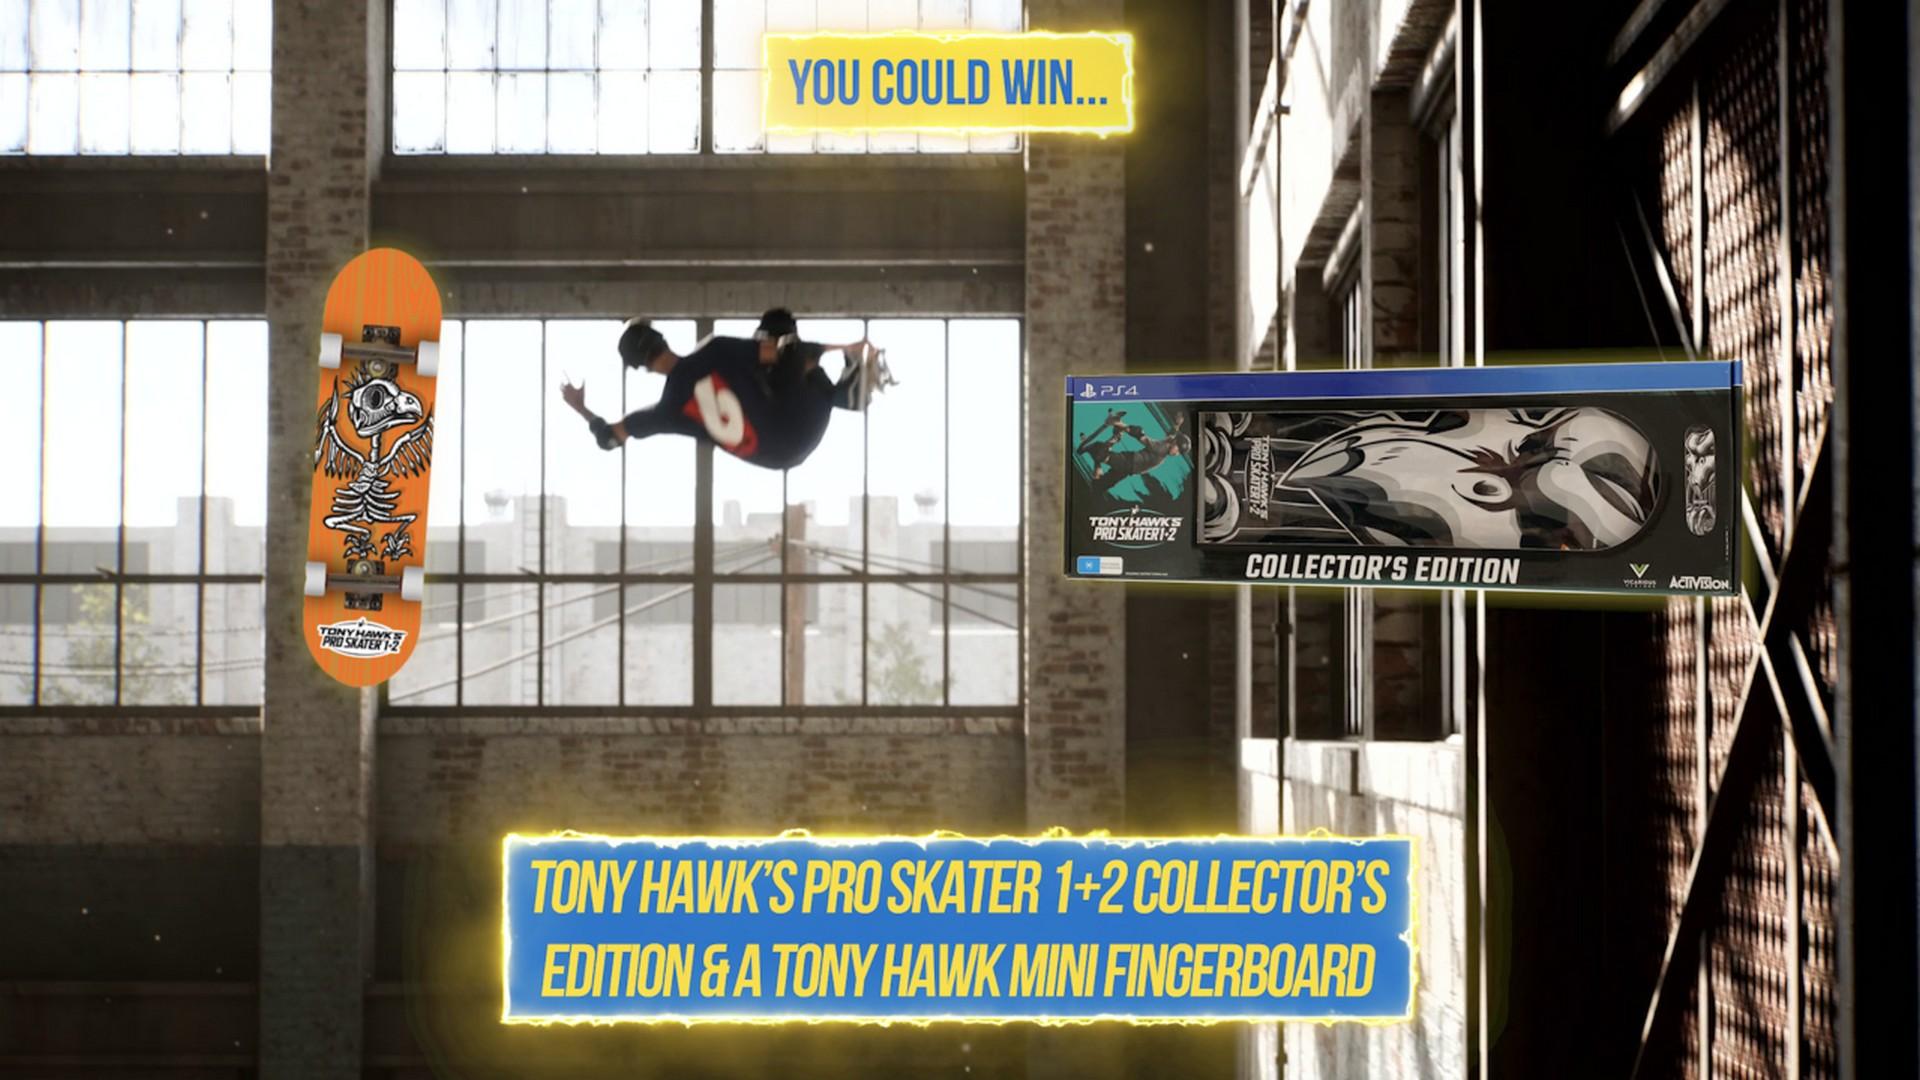 PlayStation Australia Announces #PSPlusPlays Challenge For September With Tony Hawk's Pro Skater 1 + 2